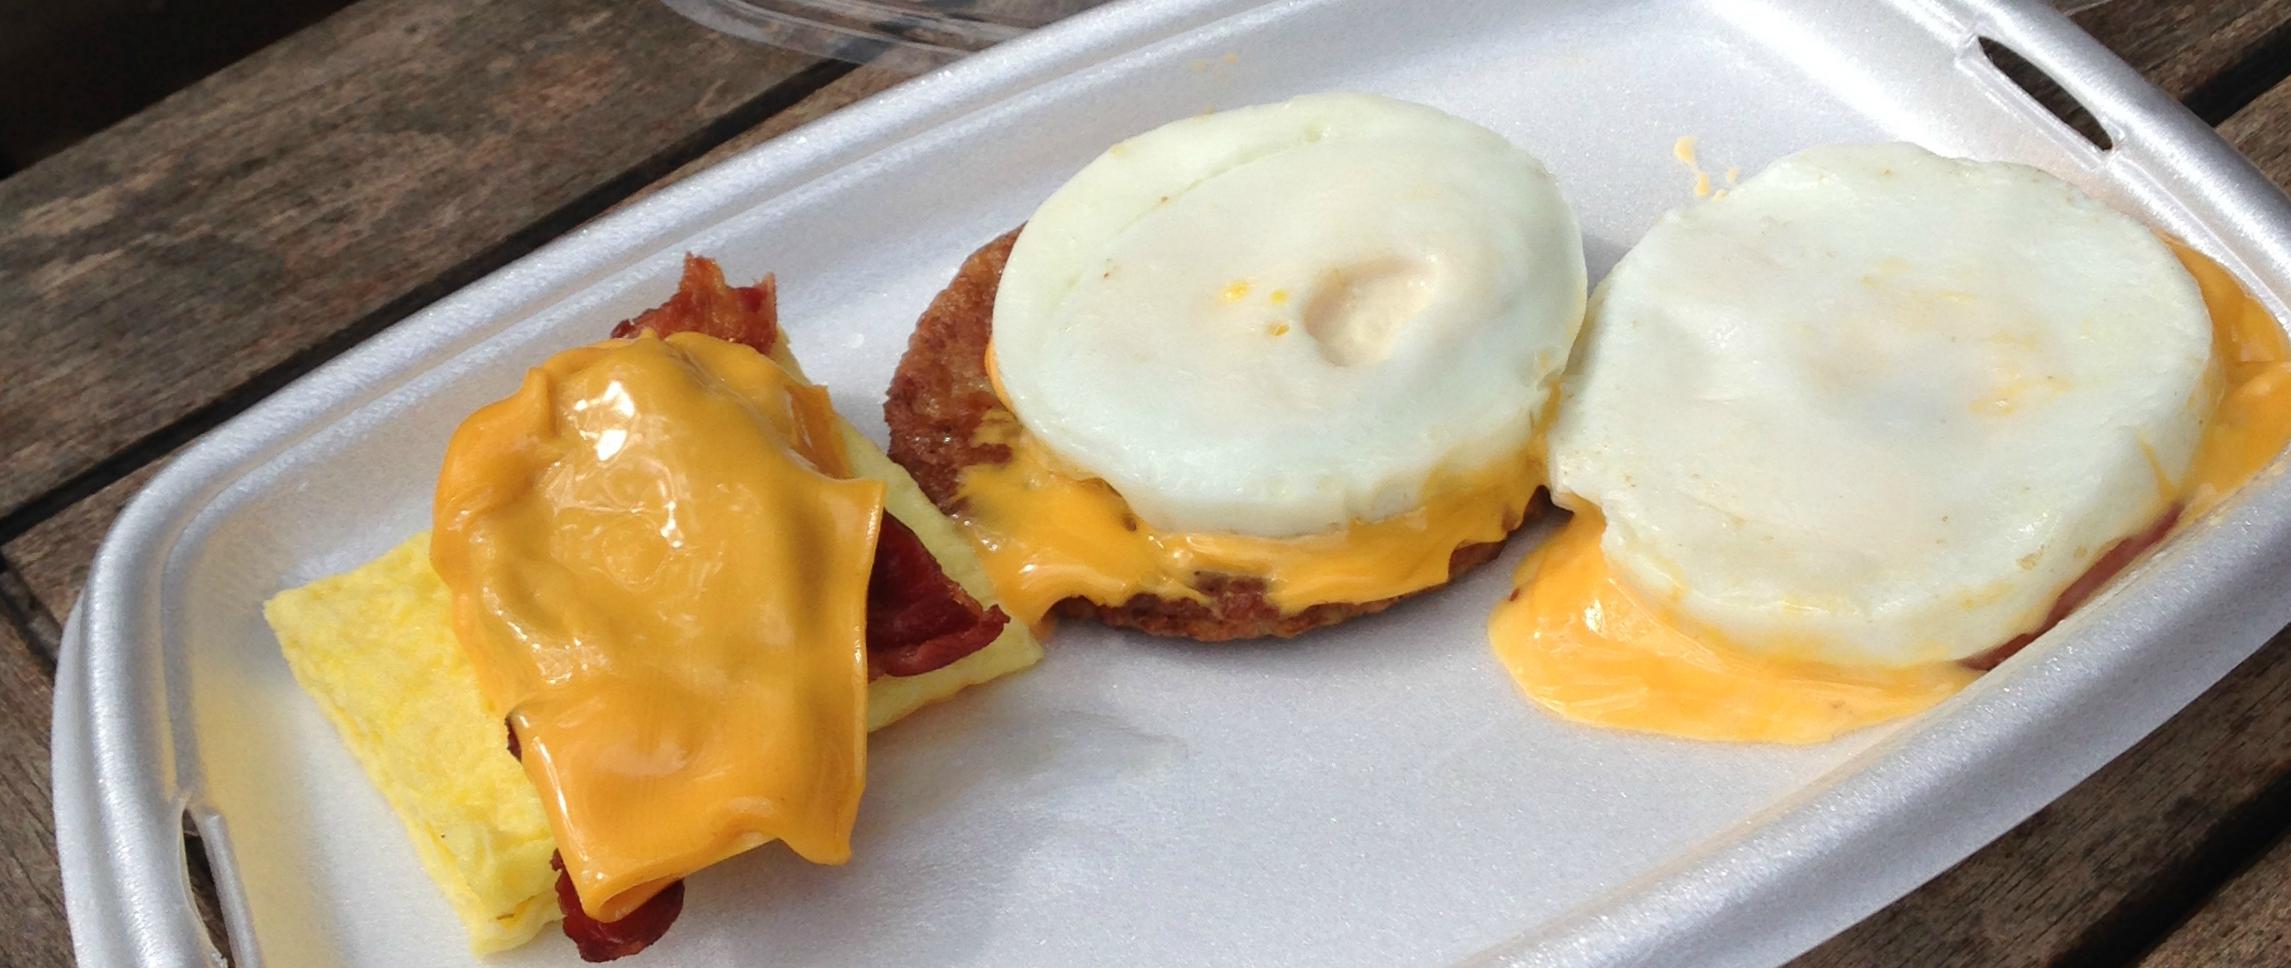 low carb mcdonald's breakfast guide – mr. skinnypants